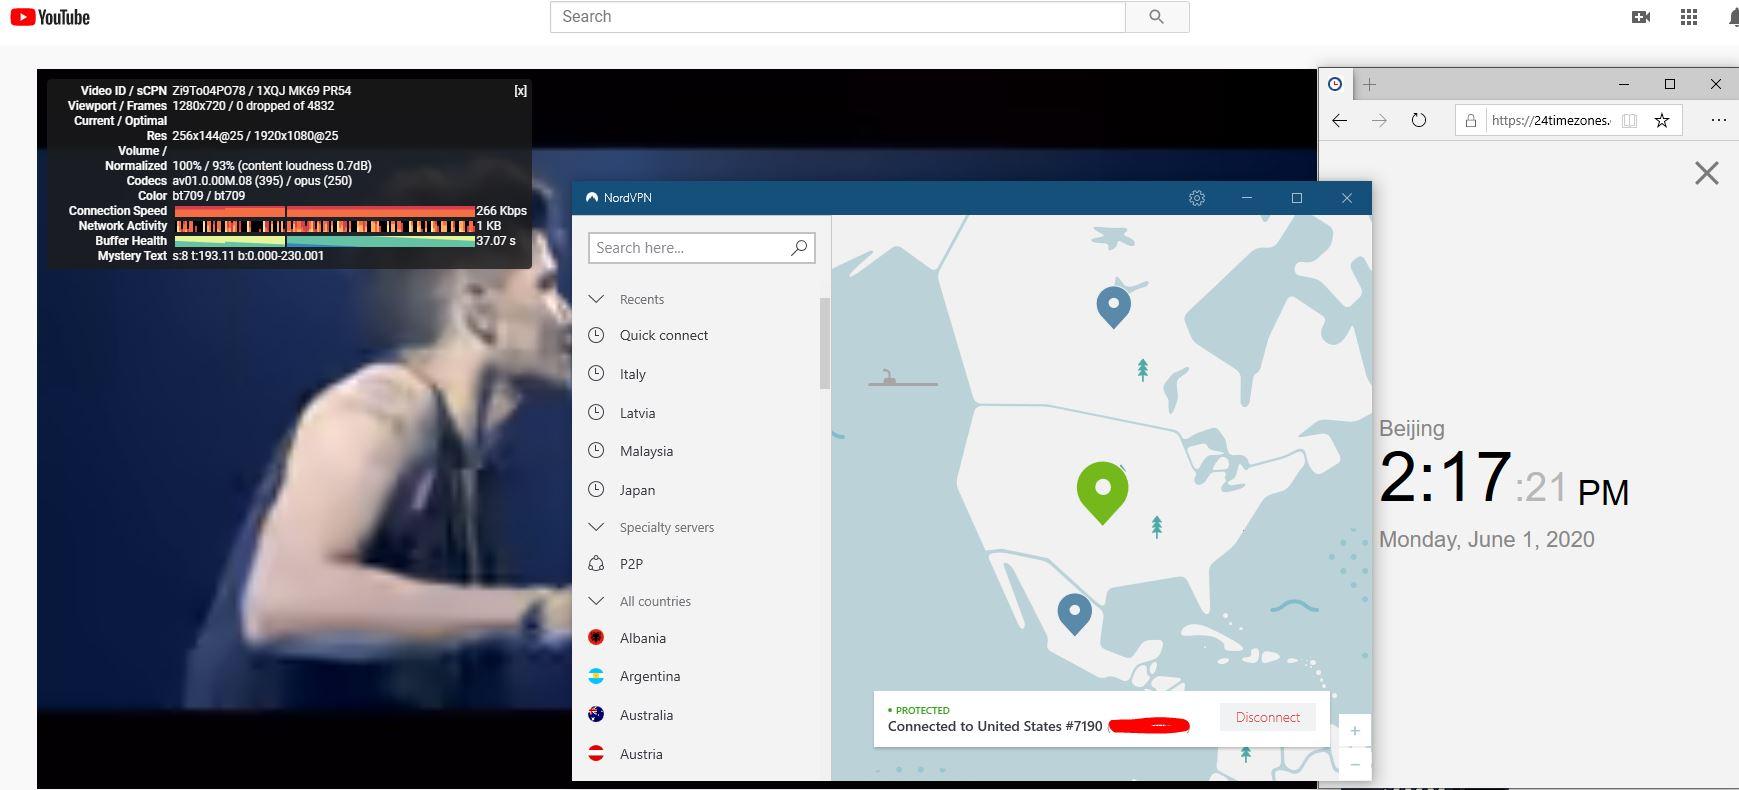 Windows10 NordVPN NordLynx协议 USA #7190 中国VPN 翻墙 科学上网 测速-20200601